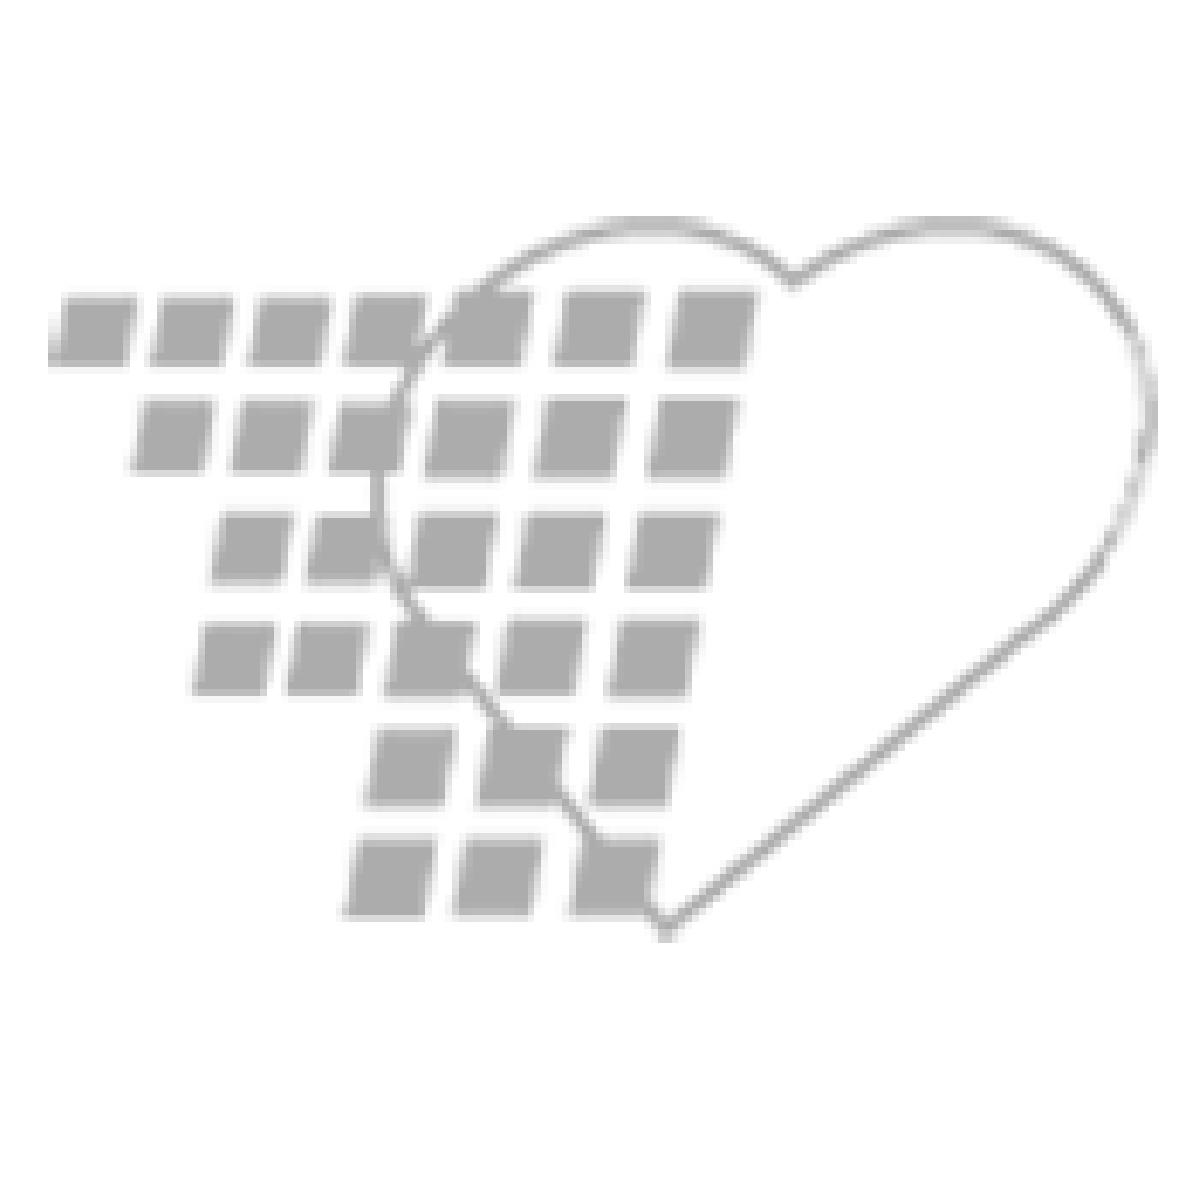 03-47-0300-MED - Innovative Healthcare Corporation NitriDerm® Sterile Pairs CHEMO Rated - Medium